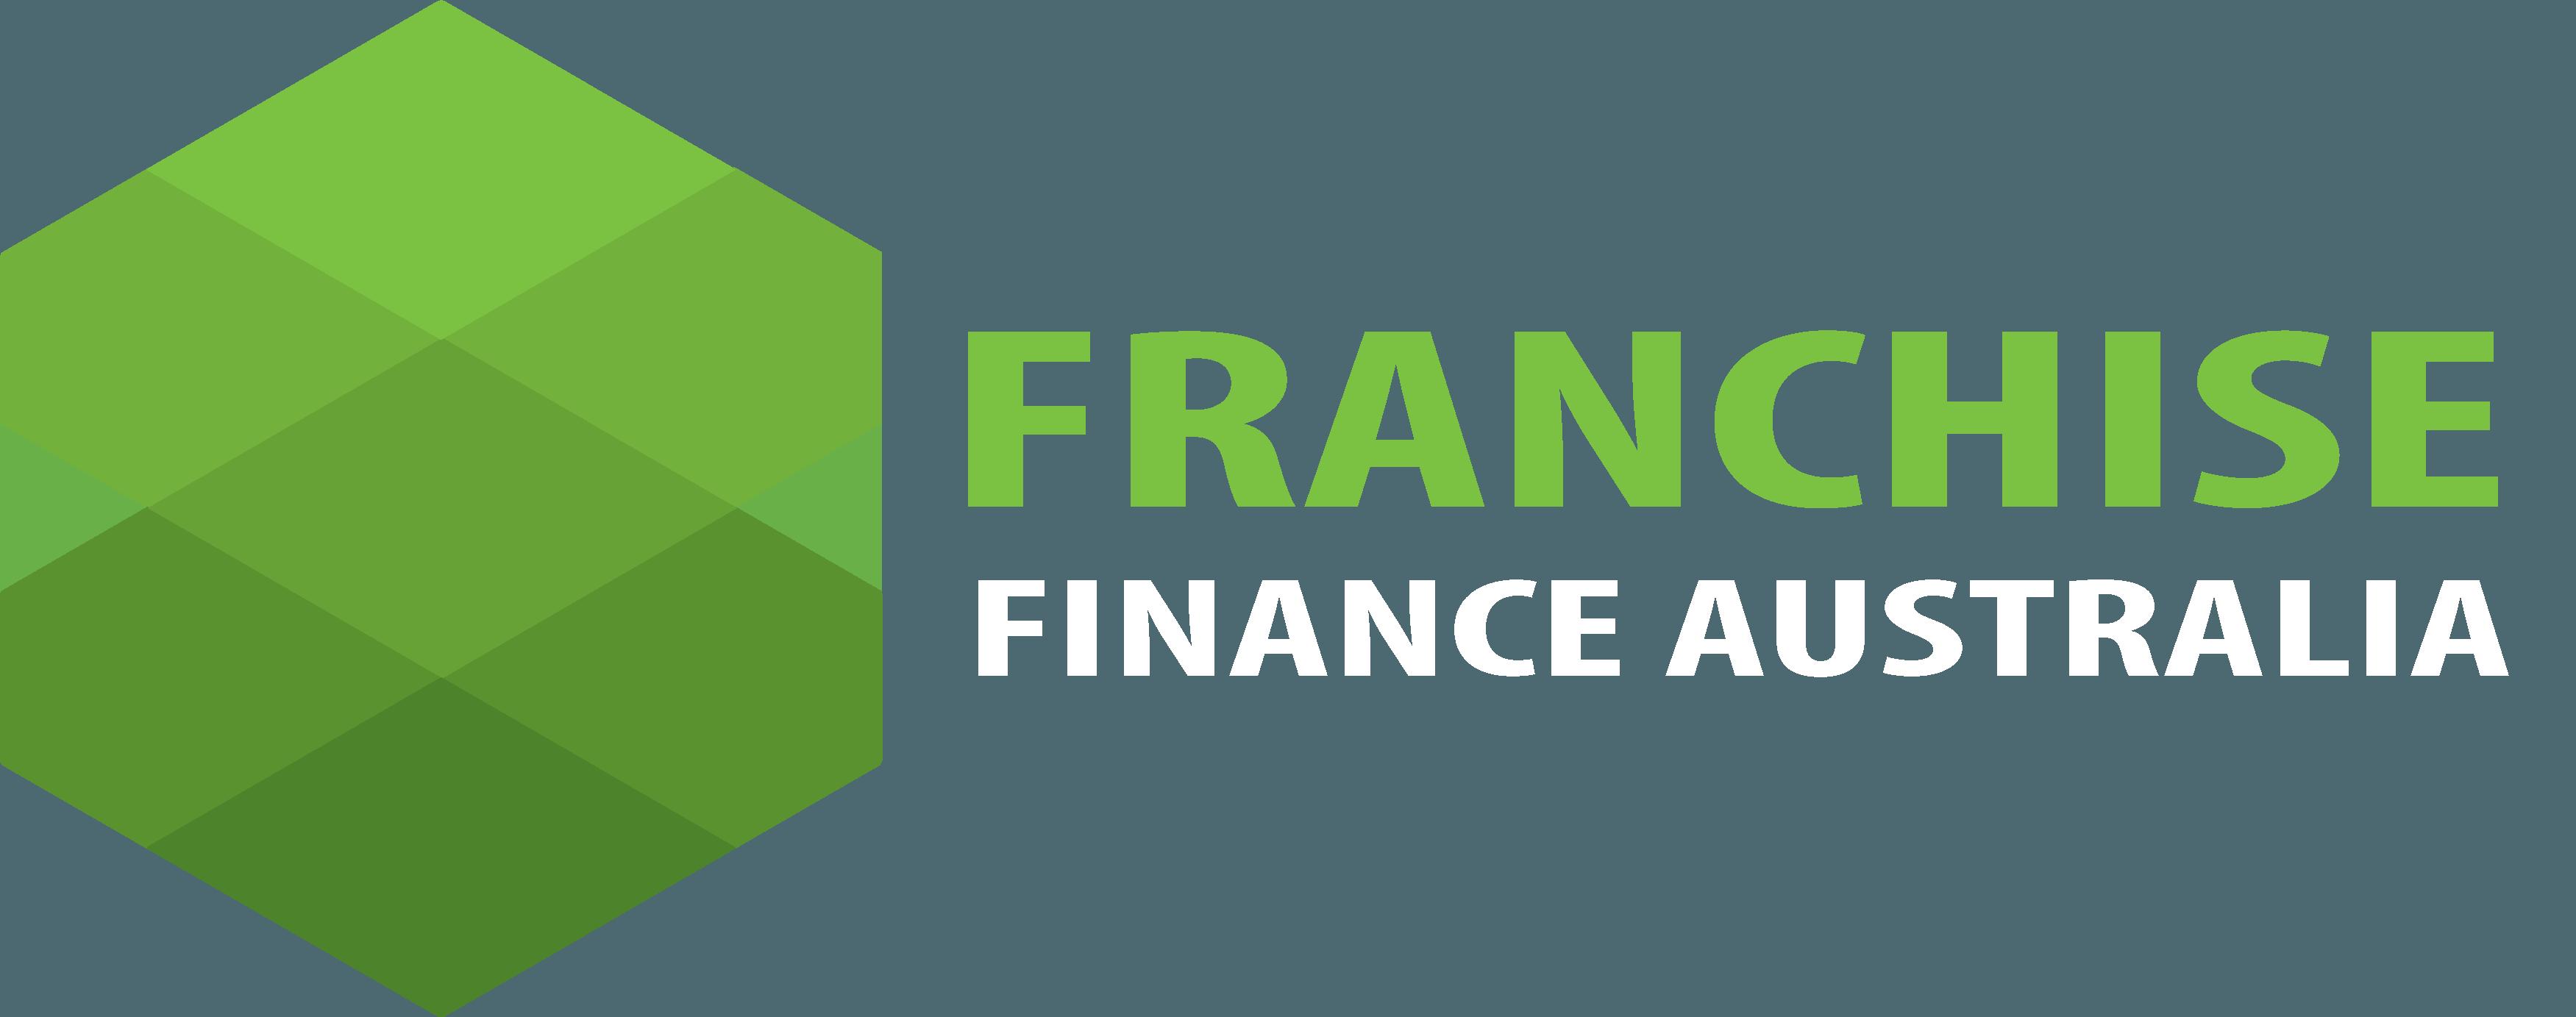 Franchise Finance Australia